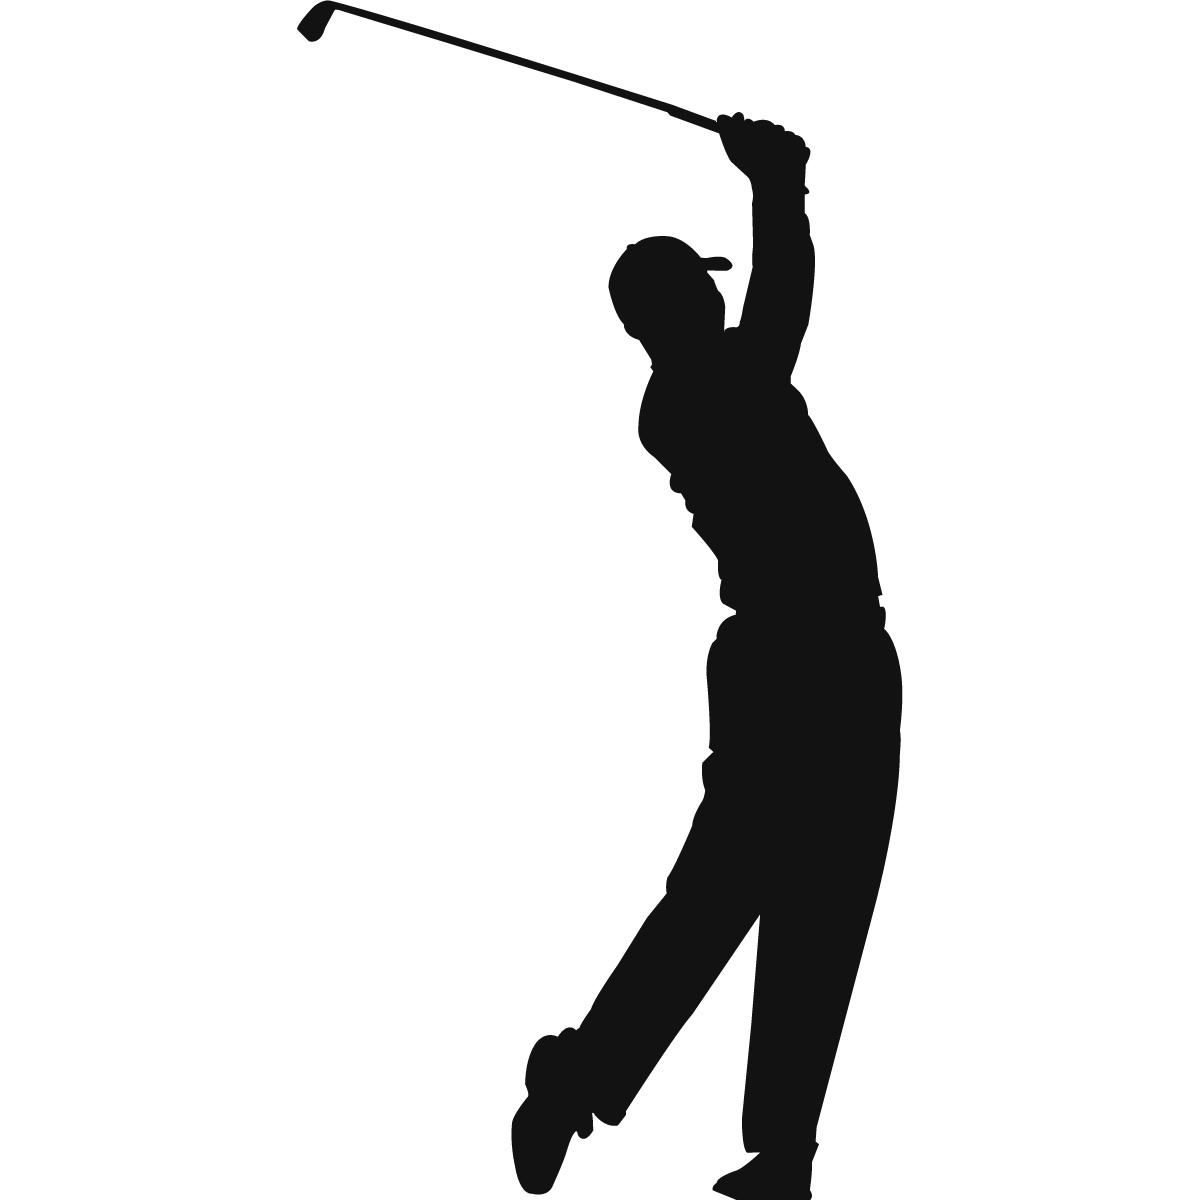 Golf S Clipart-Golf s clipart-12